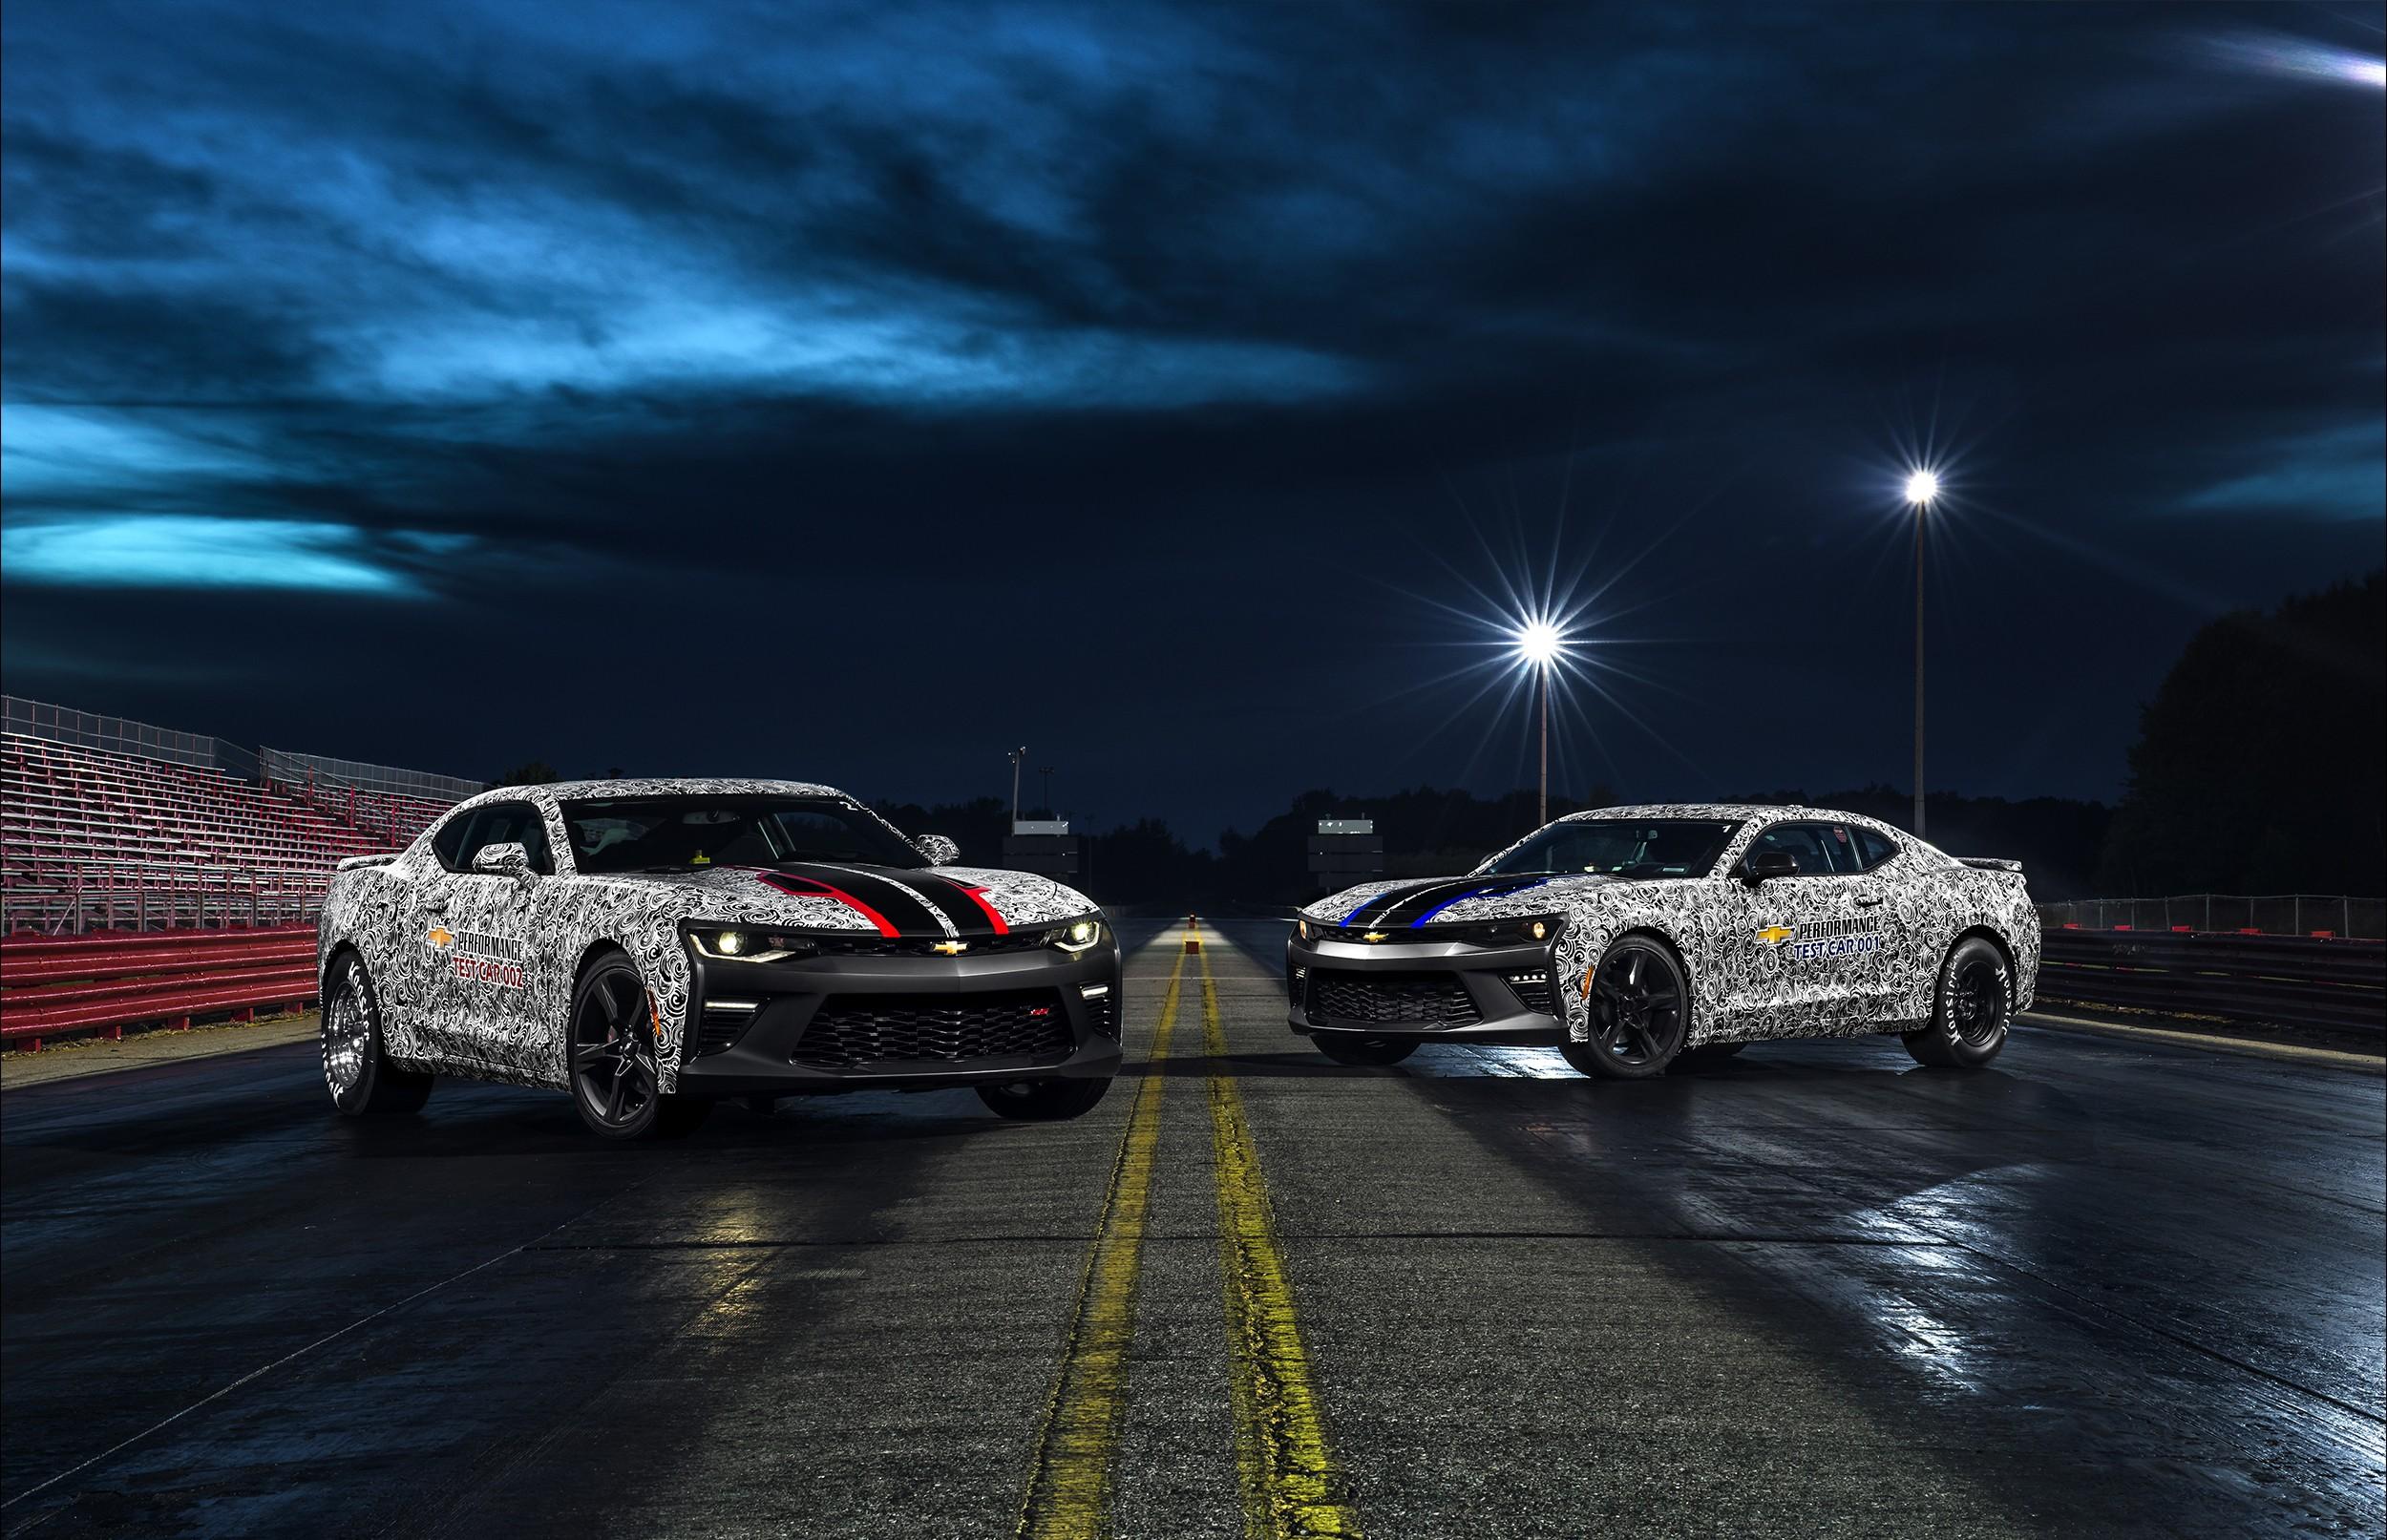 2017 Copo Camaro Revealed Alongside Camaro Ss Drag Racing Prototypes Autoevolution